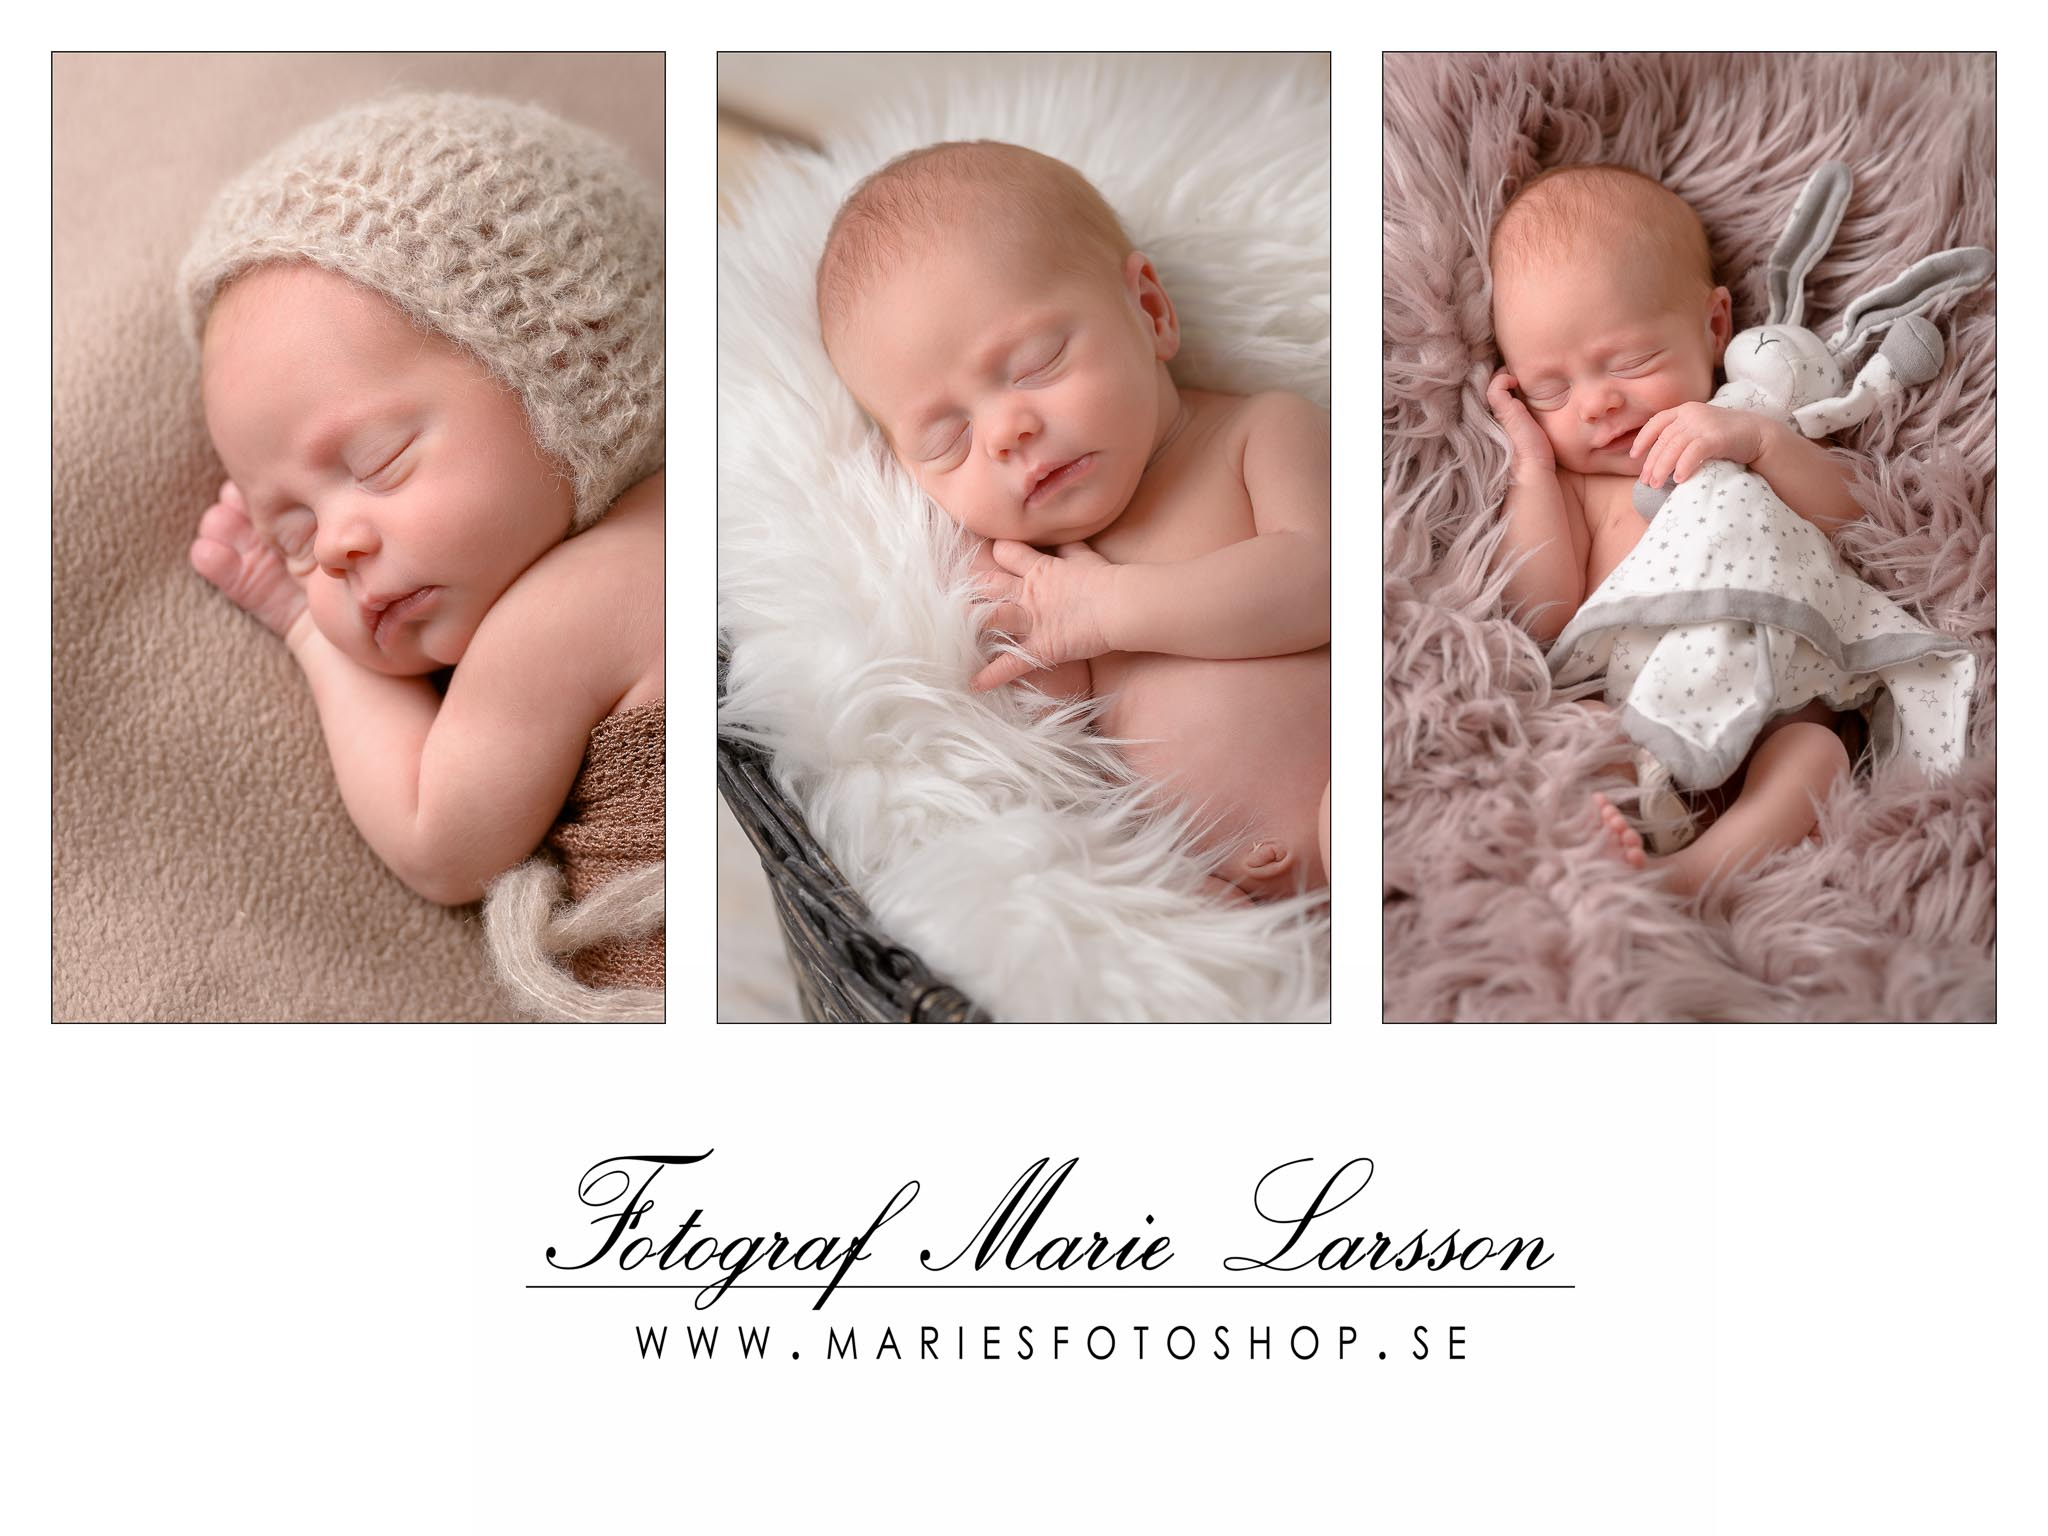 Nyföddsfotografering Stenungsund, Tjörn, Orust, Kungälv, Göteborg, Uddevalla, Fotograf, Barnfotograf,